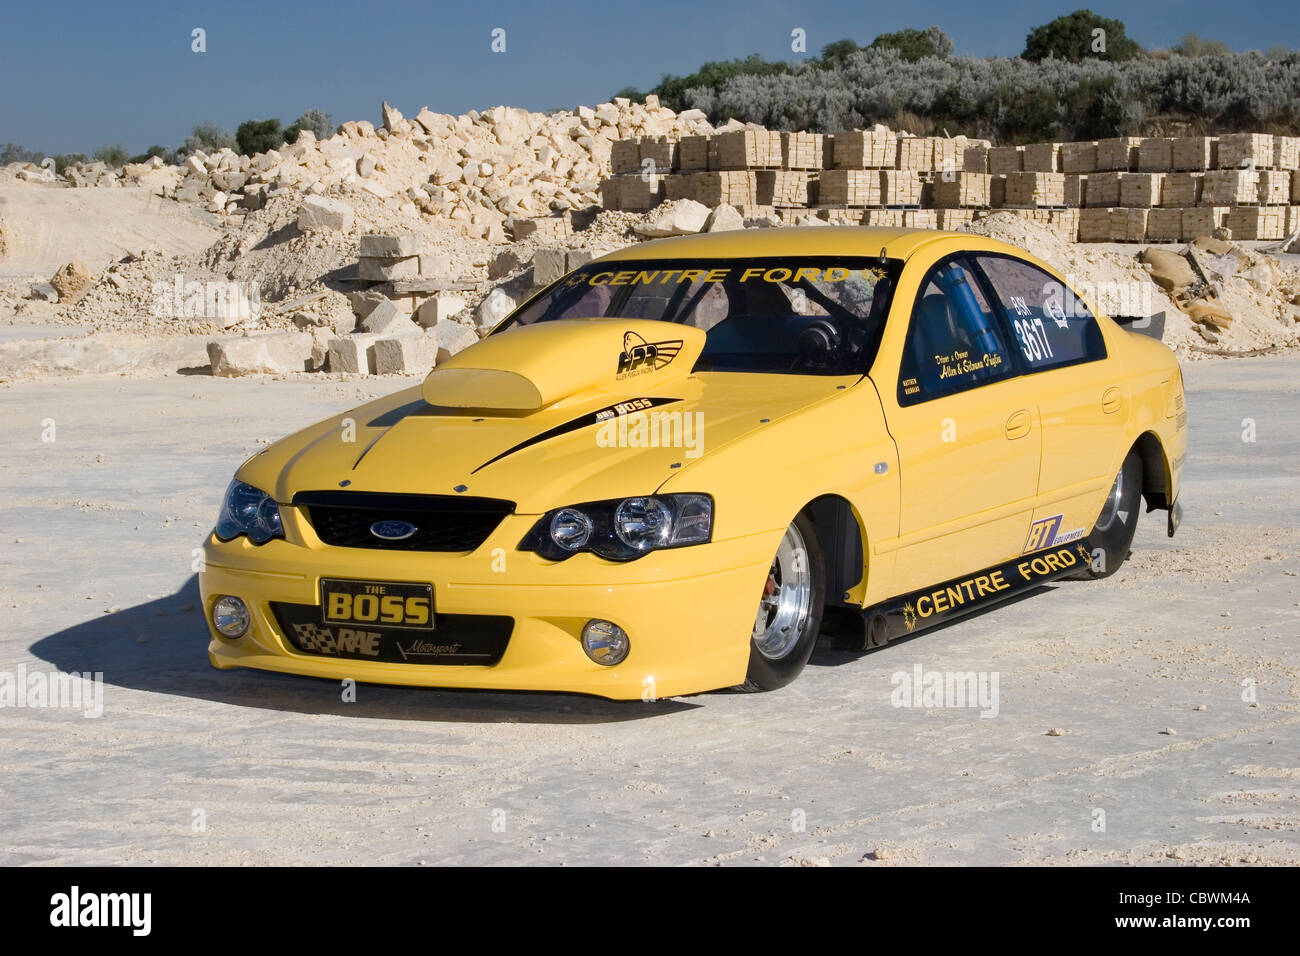 Australian ford falcon drag racing car